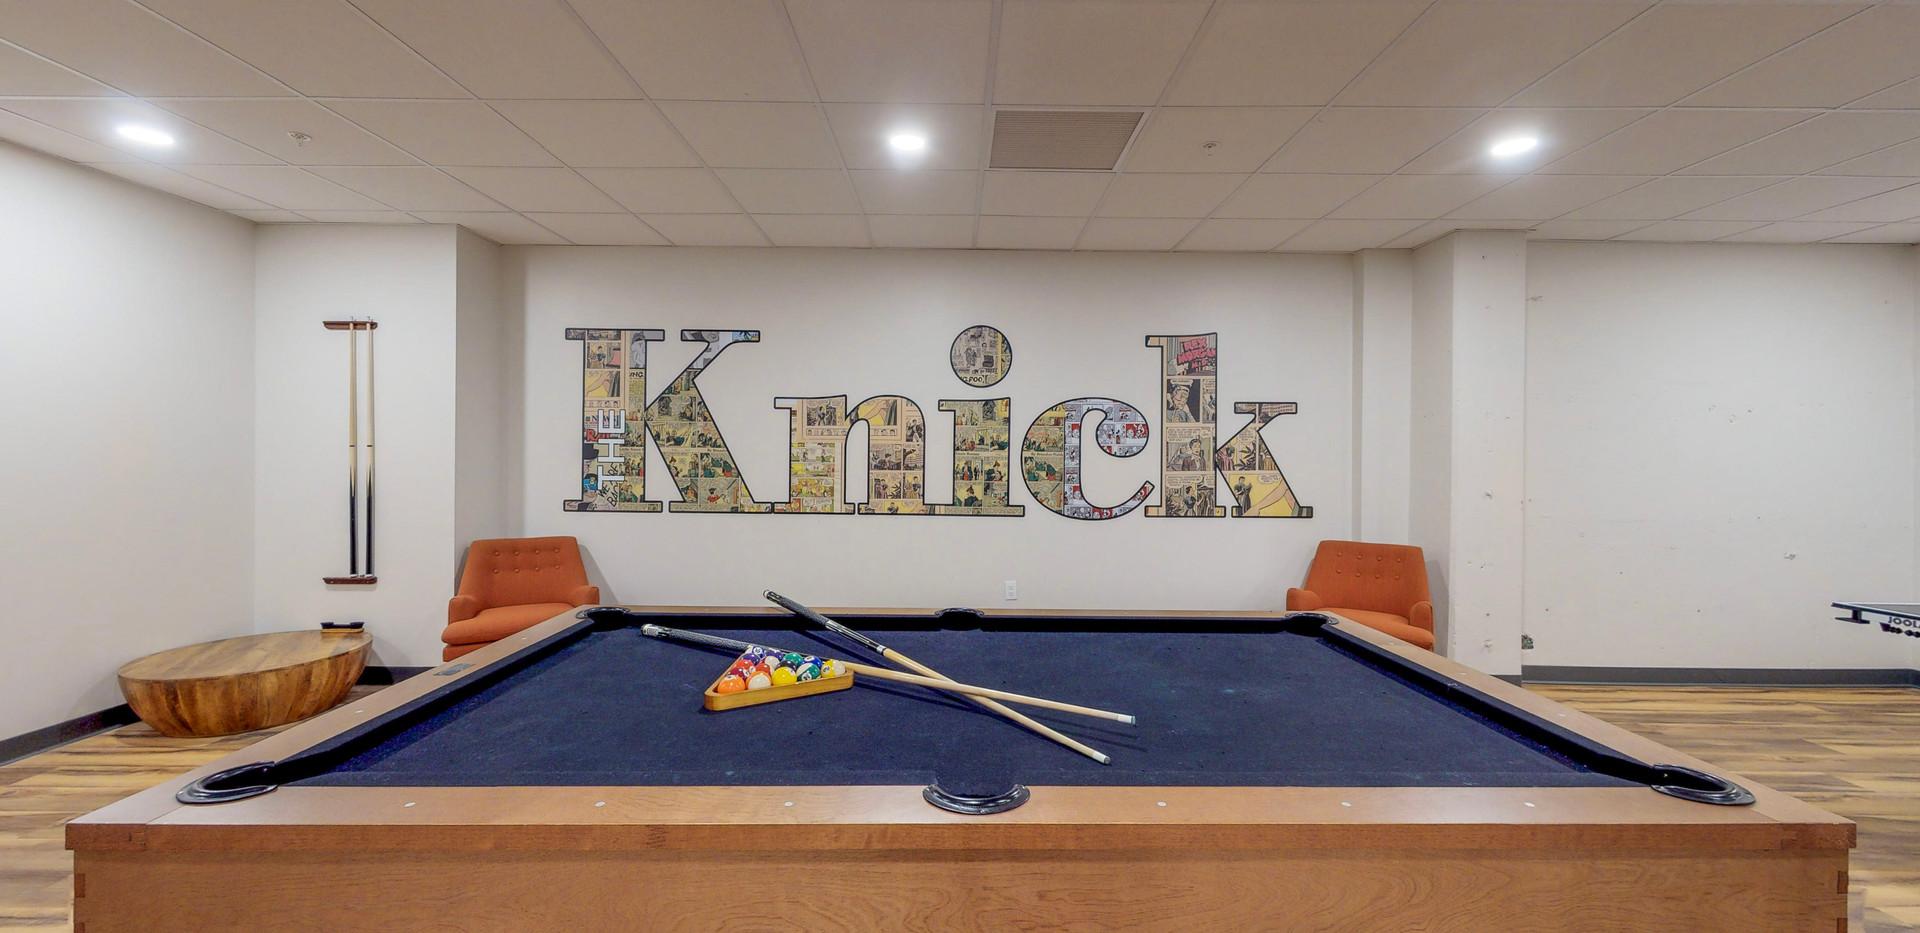 3-Knick-2-01152020_211551.jpg